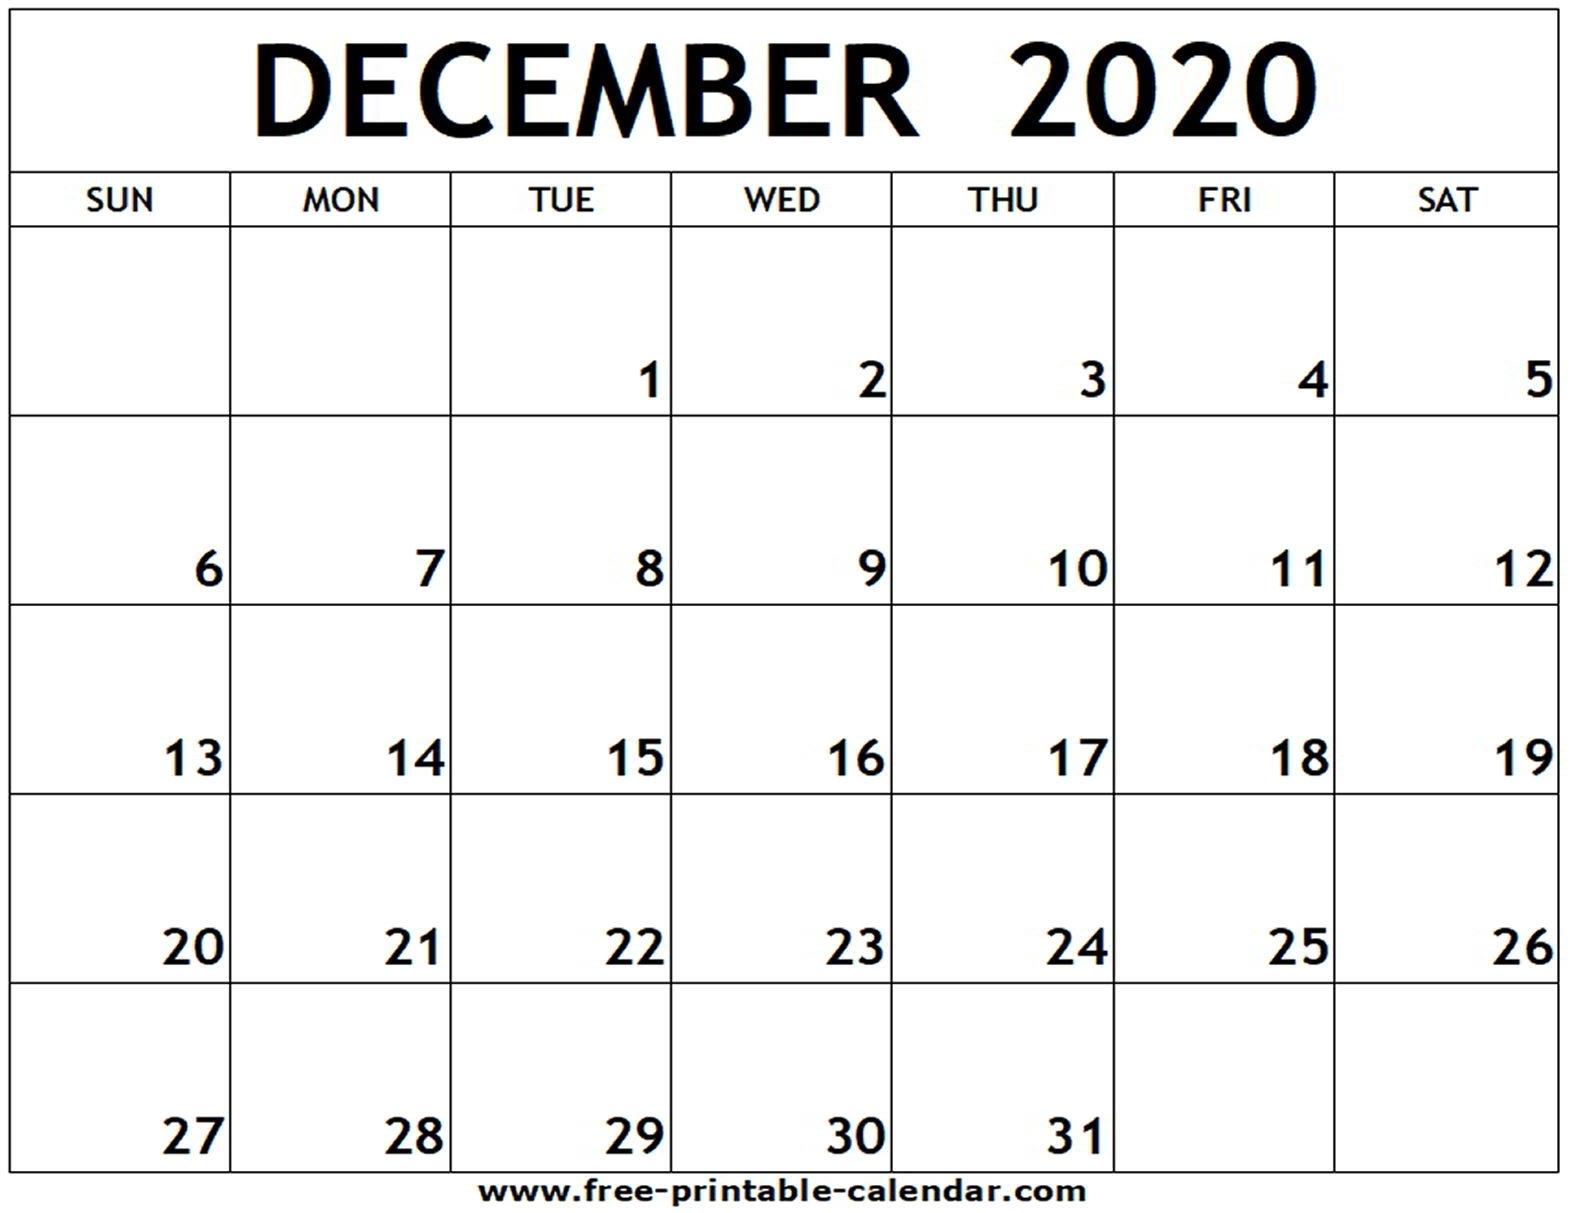 December 2020 Printable Calendar - Free-Printable-Calendar